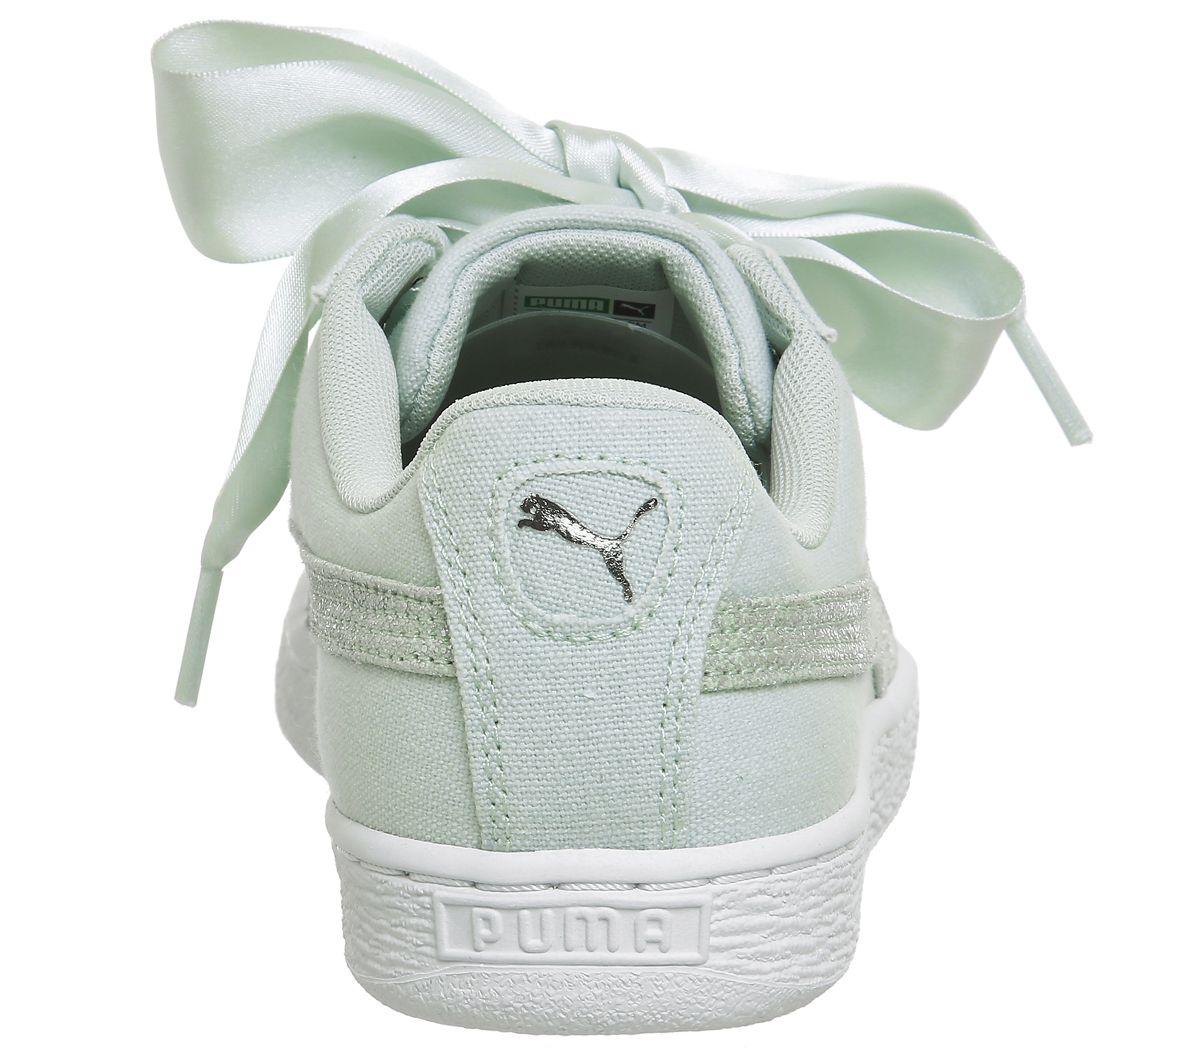 6038c695f9 Sentinel Womens Puma Basket Heart Canvas Blue Flower Puma White Silver Trainers  Shoes